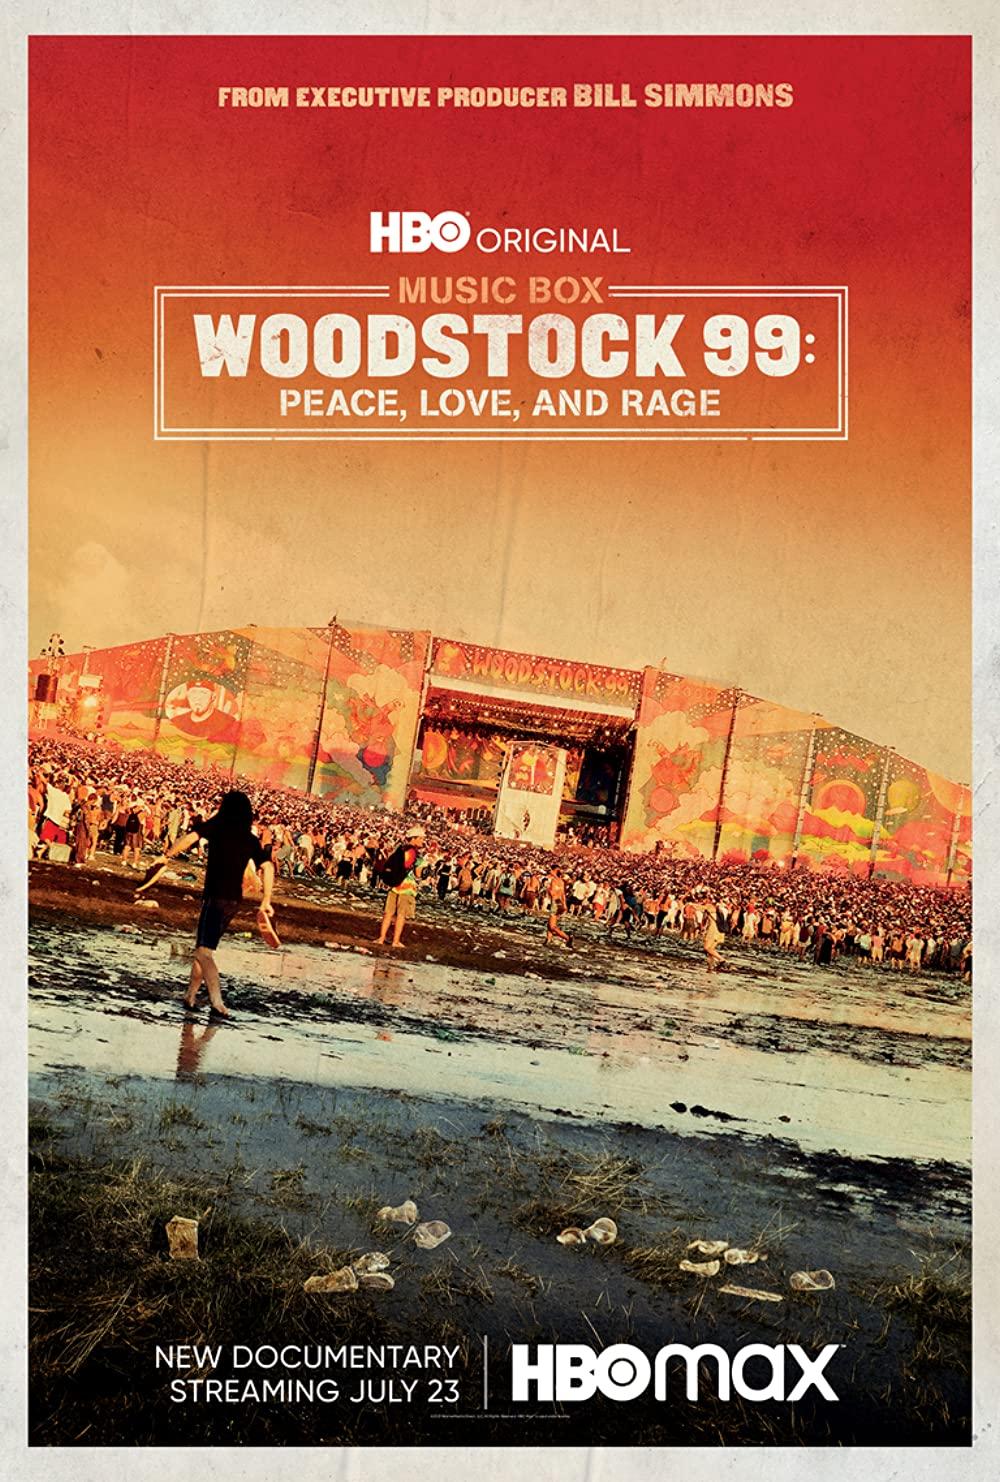 دانلود فیلم مستند Woodstock 99: Peace Love and Rage 2021